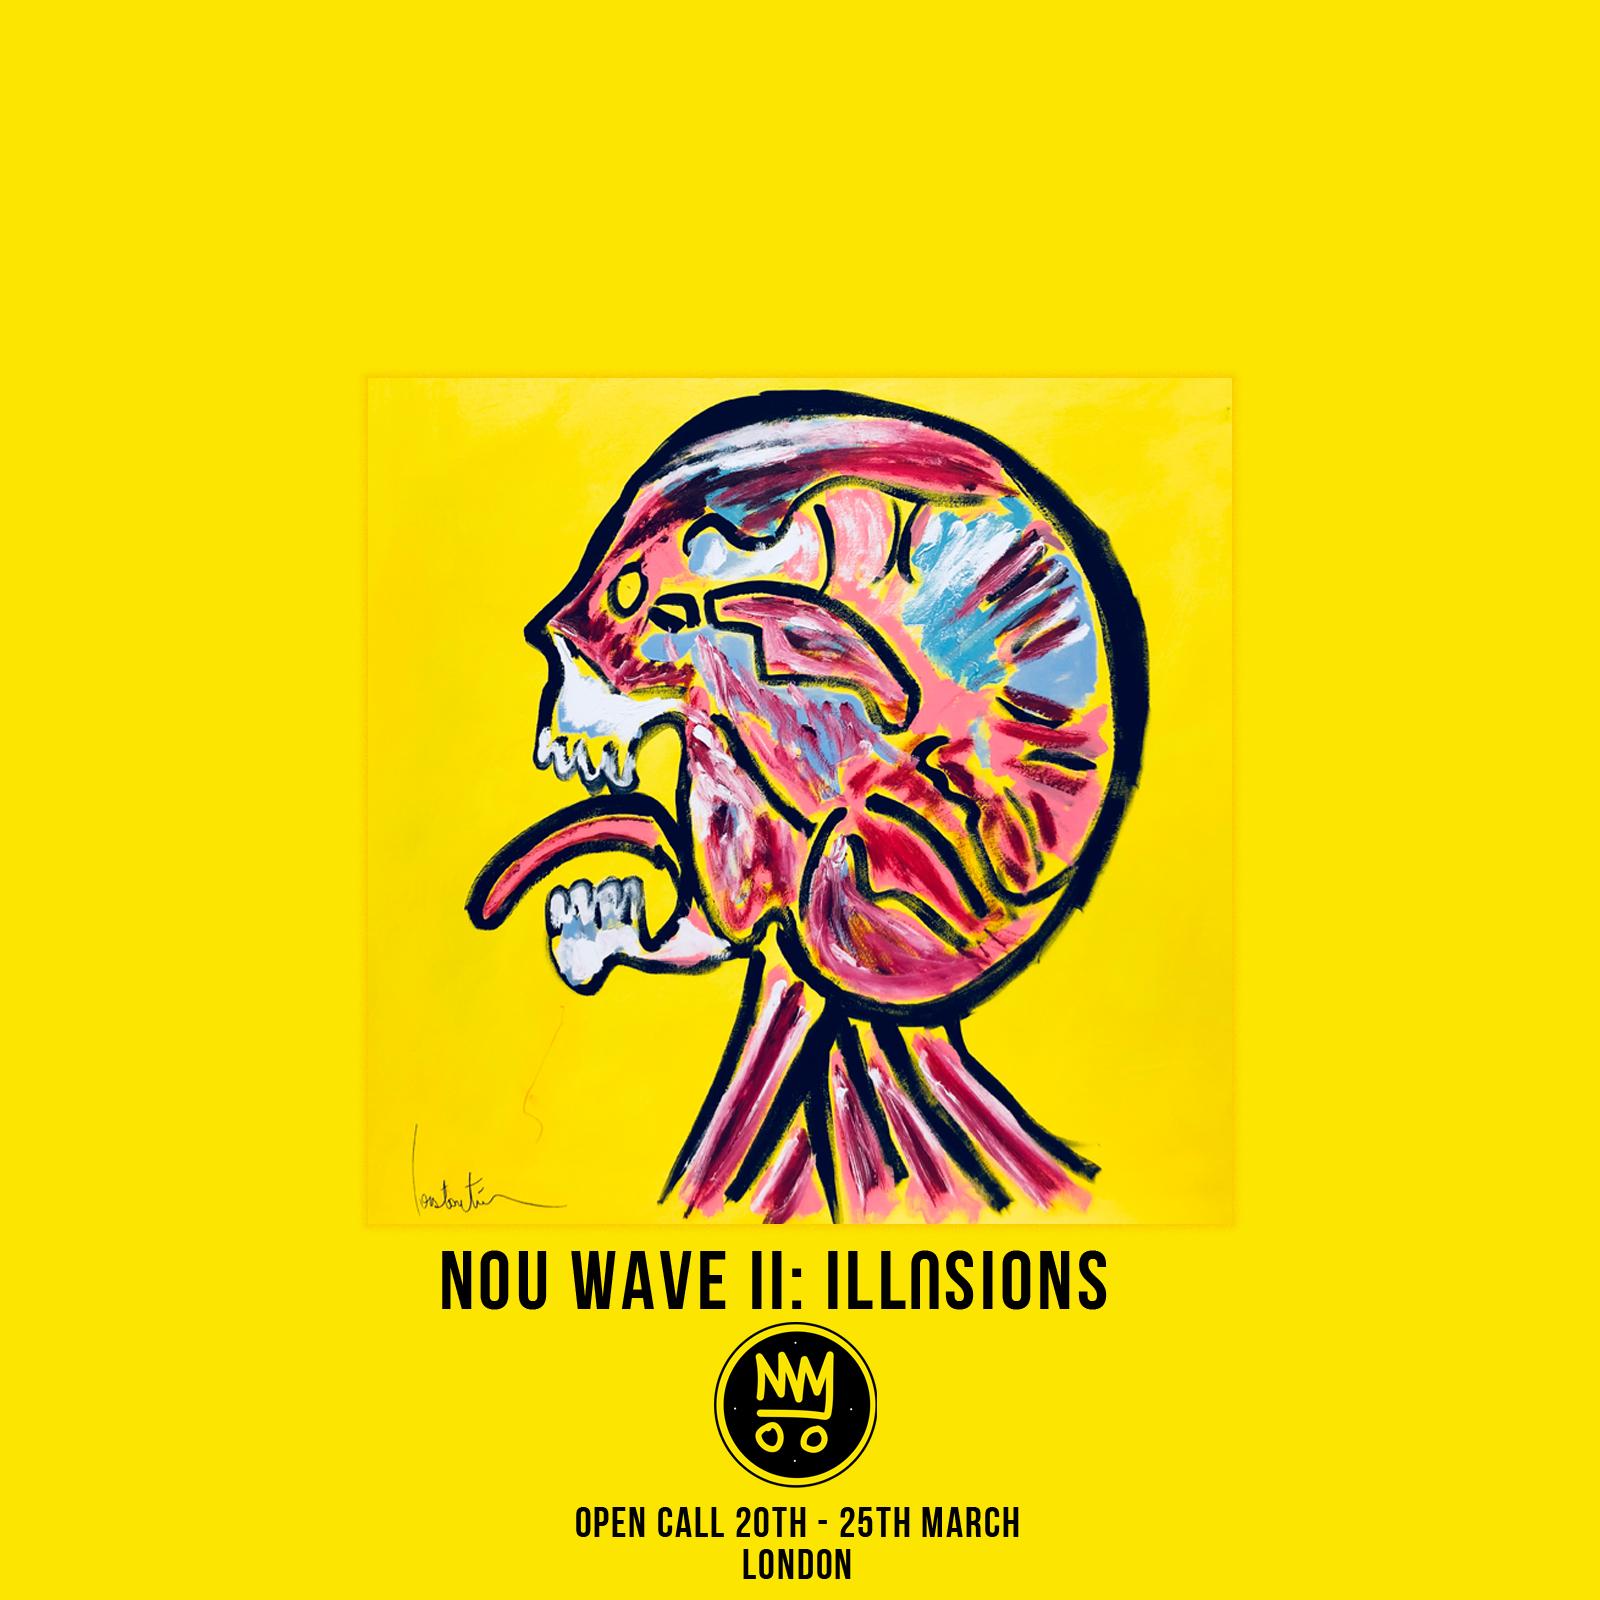 Nou Wave II: Illusions